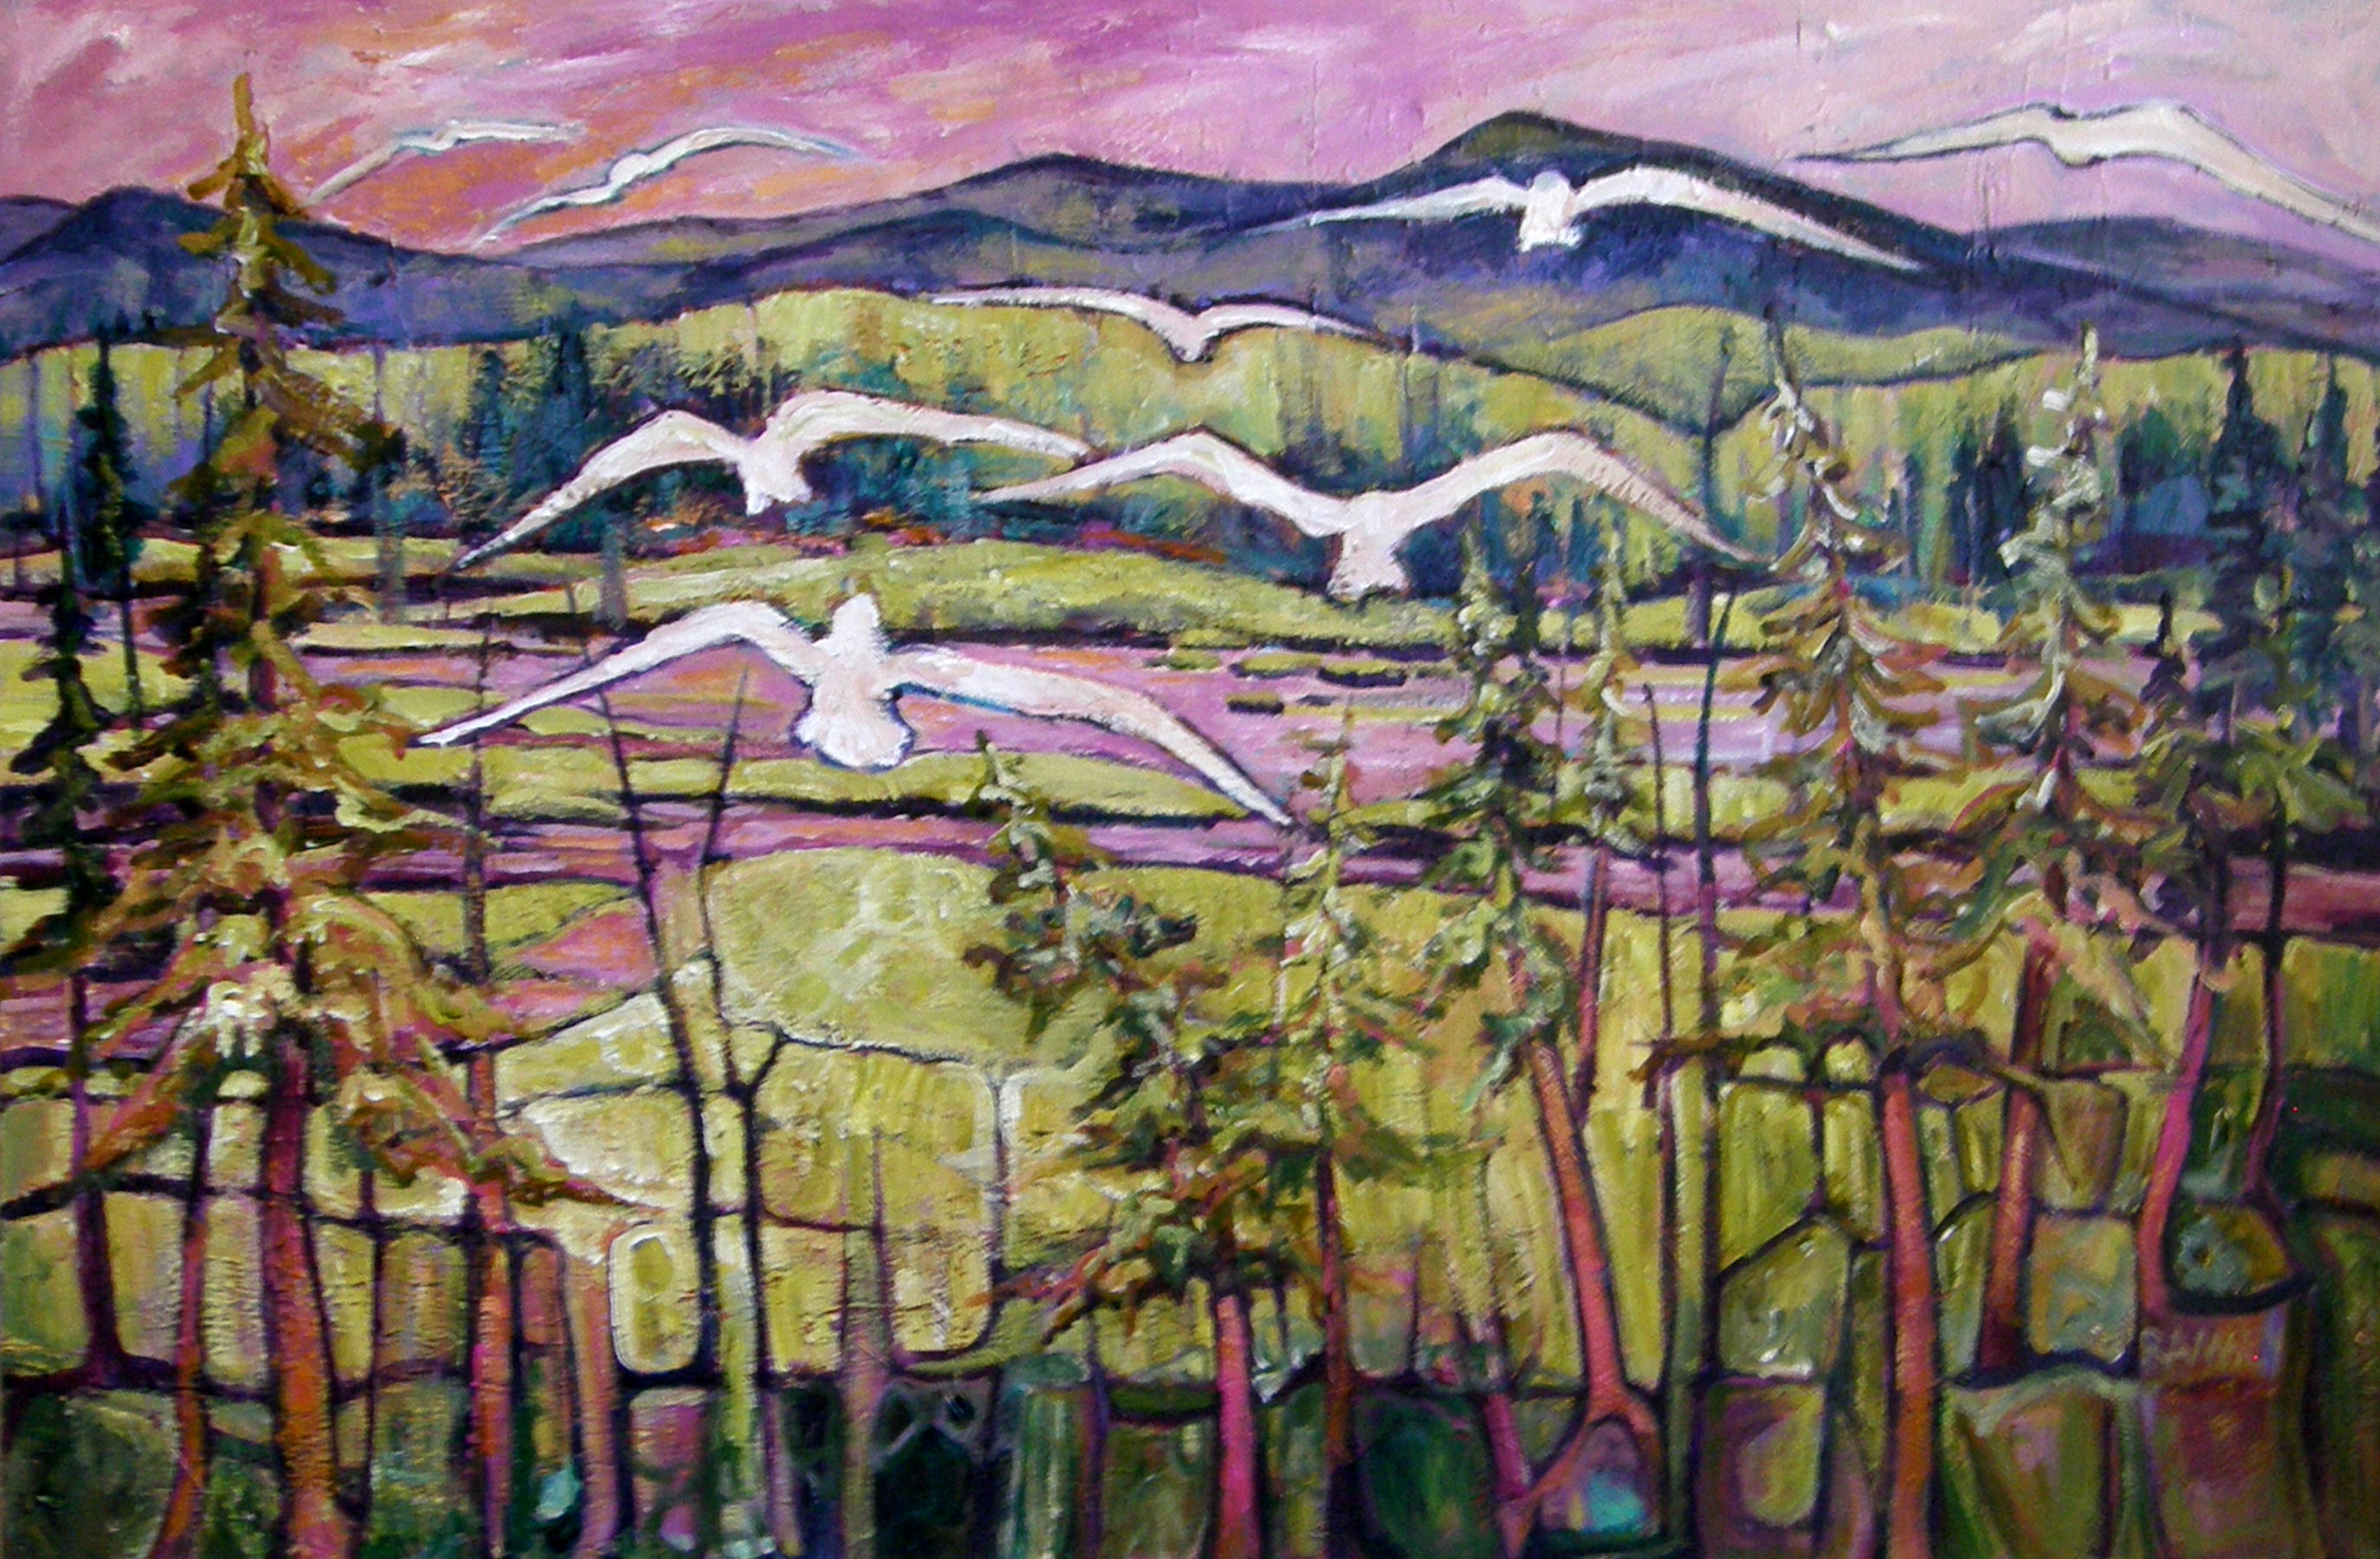 Wings in a Pink Sky